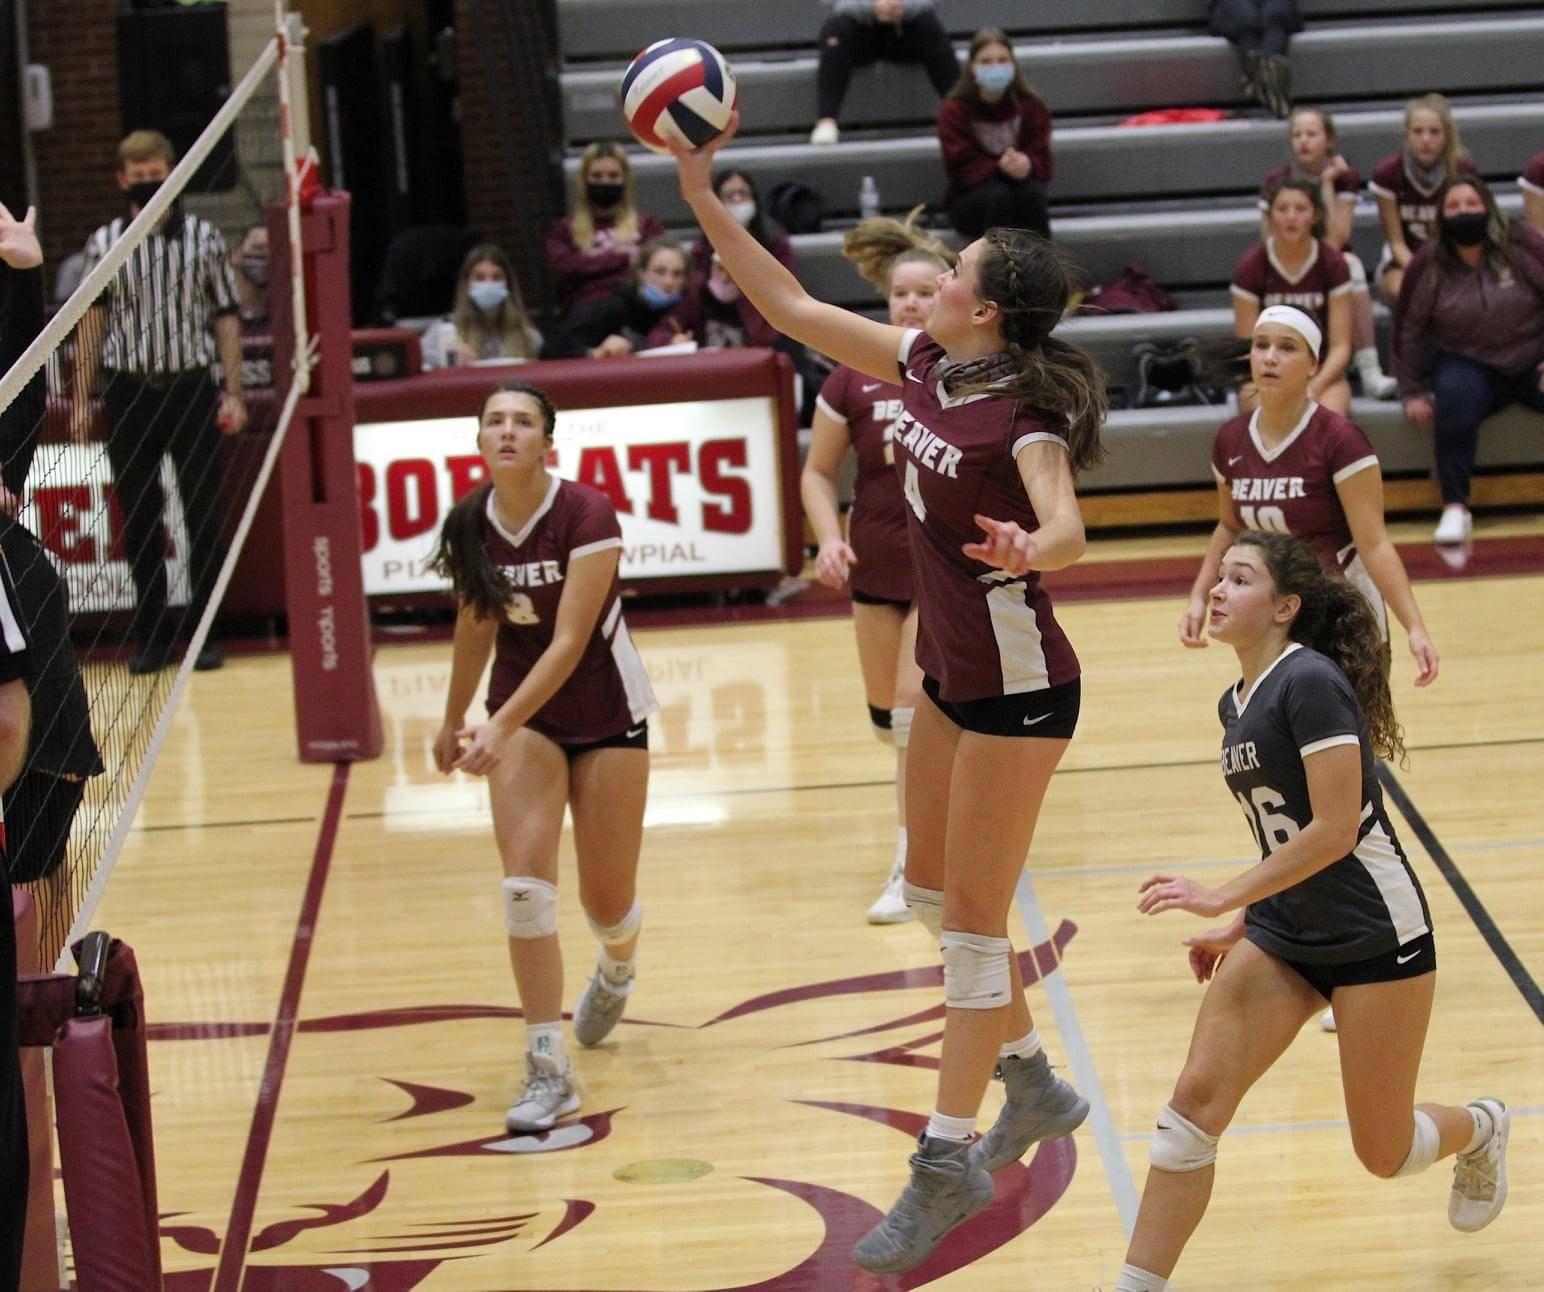 Varsity Girl's Volleyball 20-21